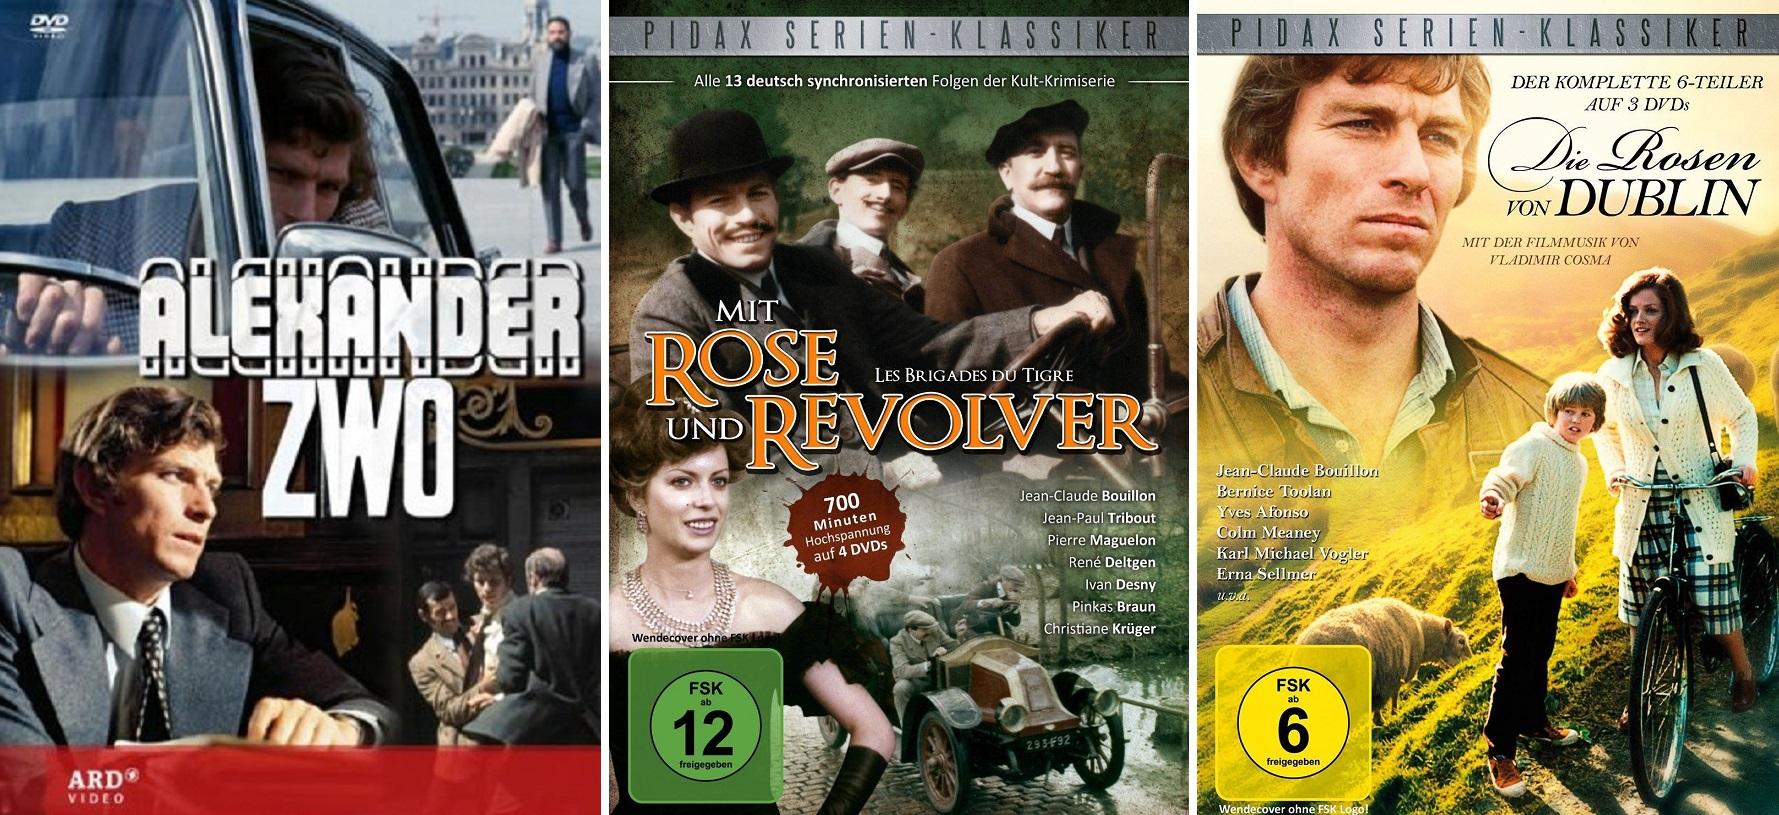 jean-claude Bouillon serien tv alexander zwo brigades du tigre roses de dublin rose und revolver rosen von dublin